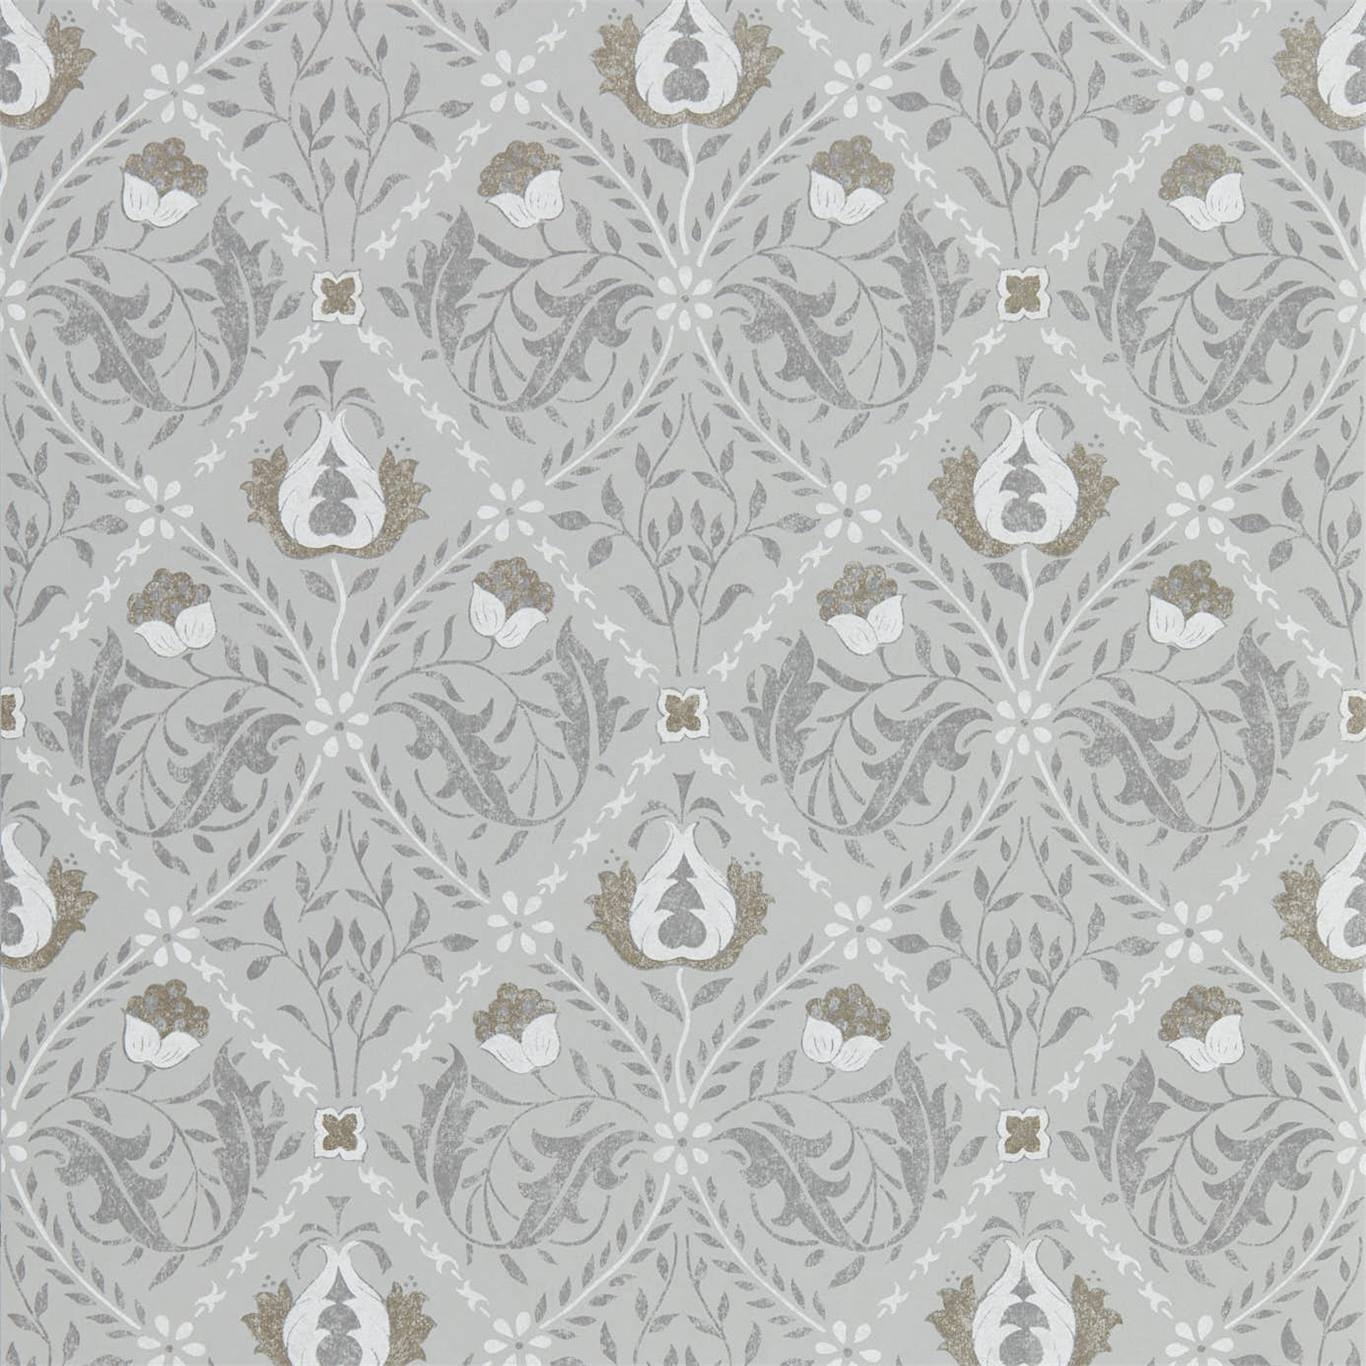 Image of Morris & Co Pure Trellis Lightish Grey Wallpaper 216528